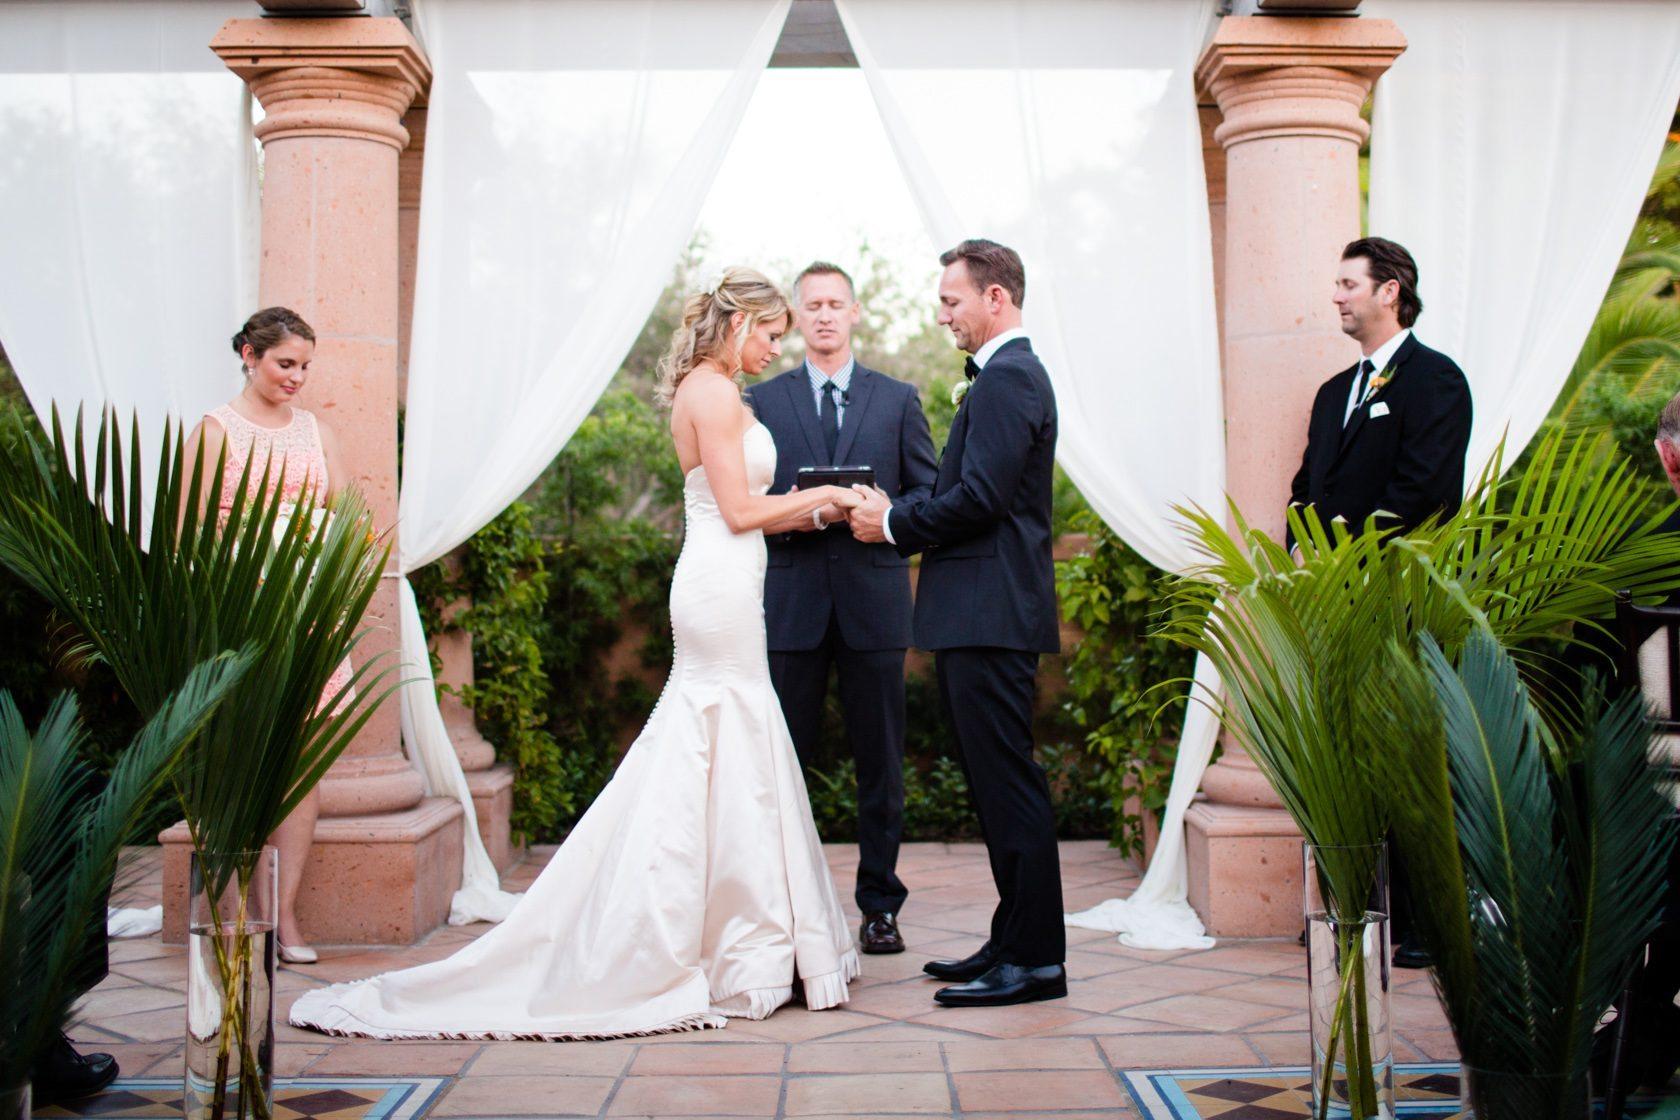 Rancho_Valencia_Resort_Wedding_080-1680x1120.jpg